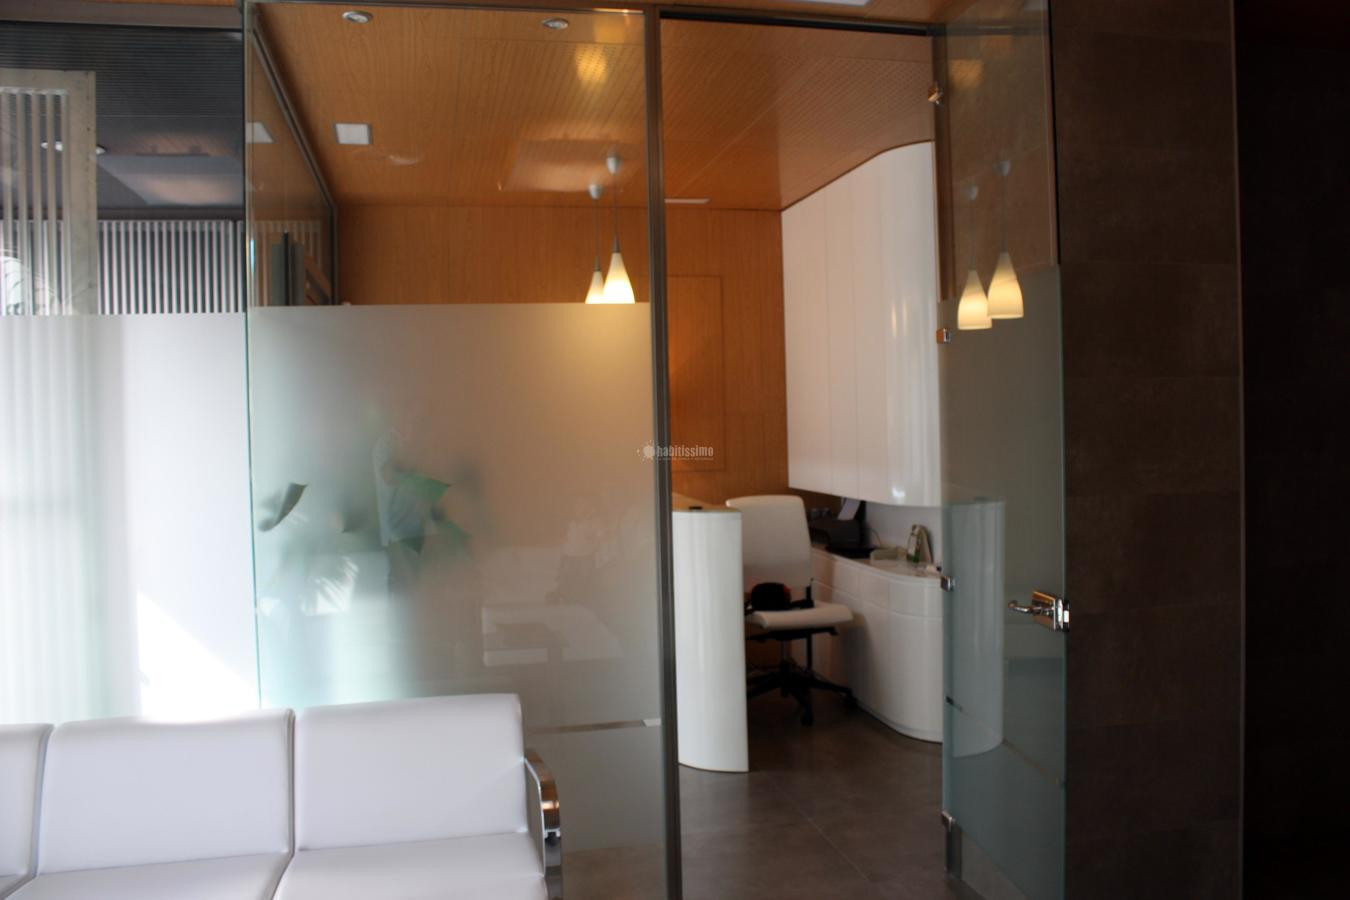 Cl nica dental ideas arquitectos t cnicos - Proyecto clinica dental ...